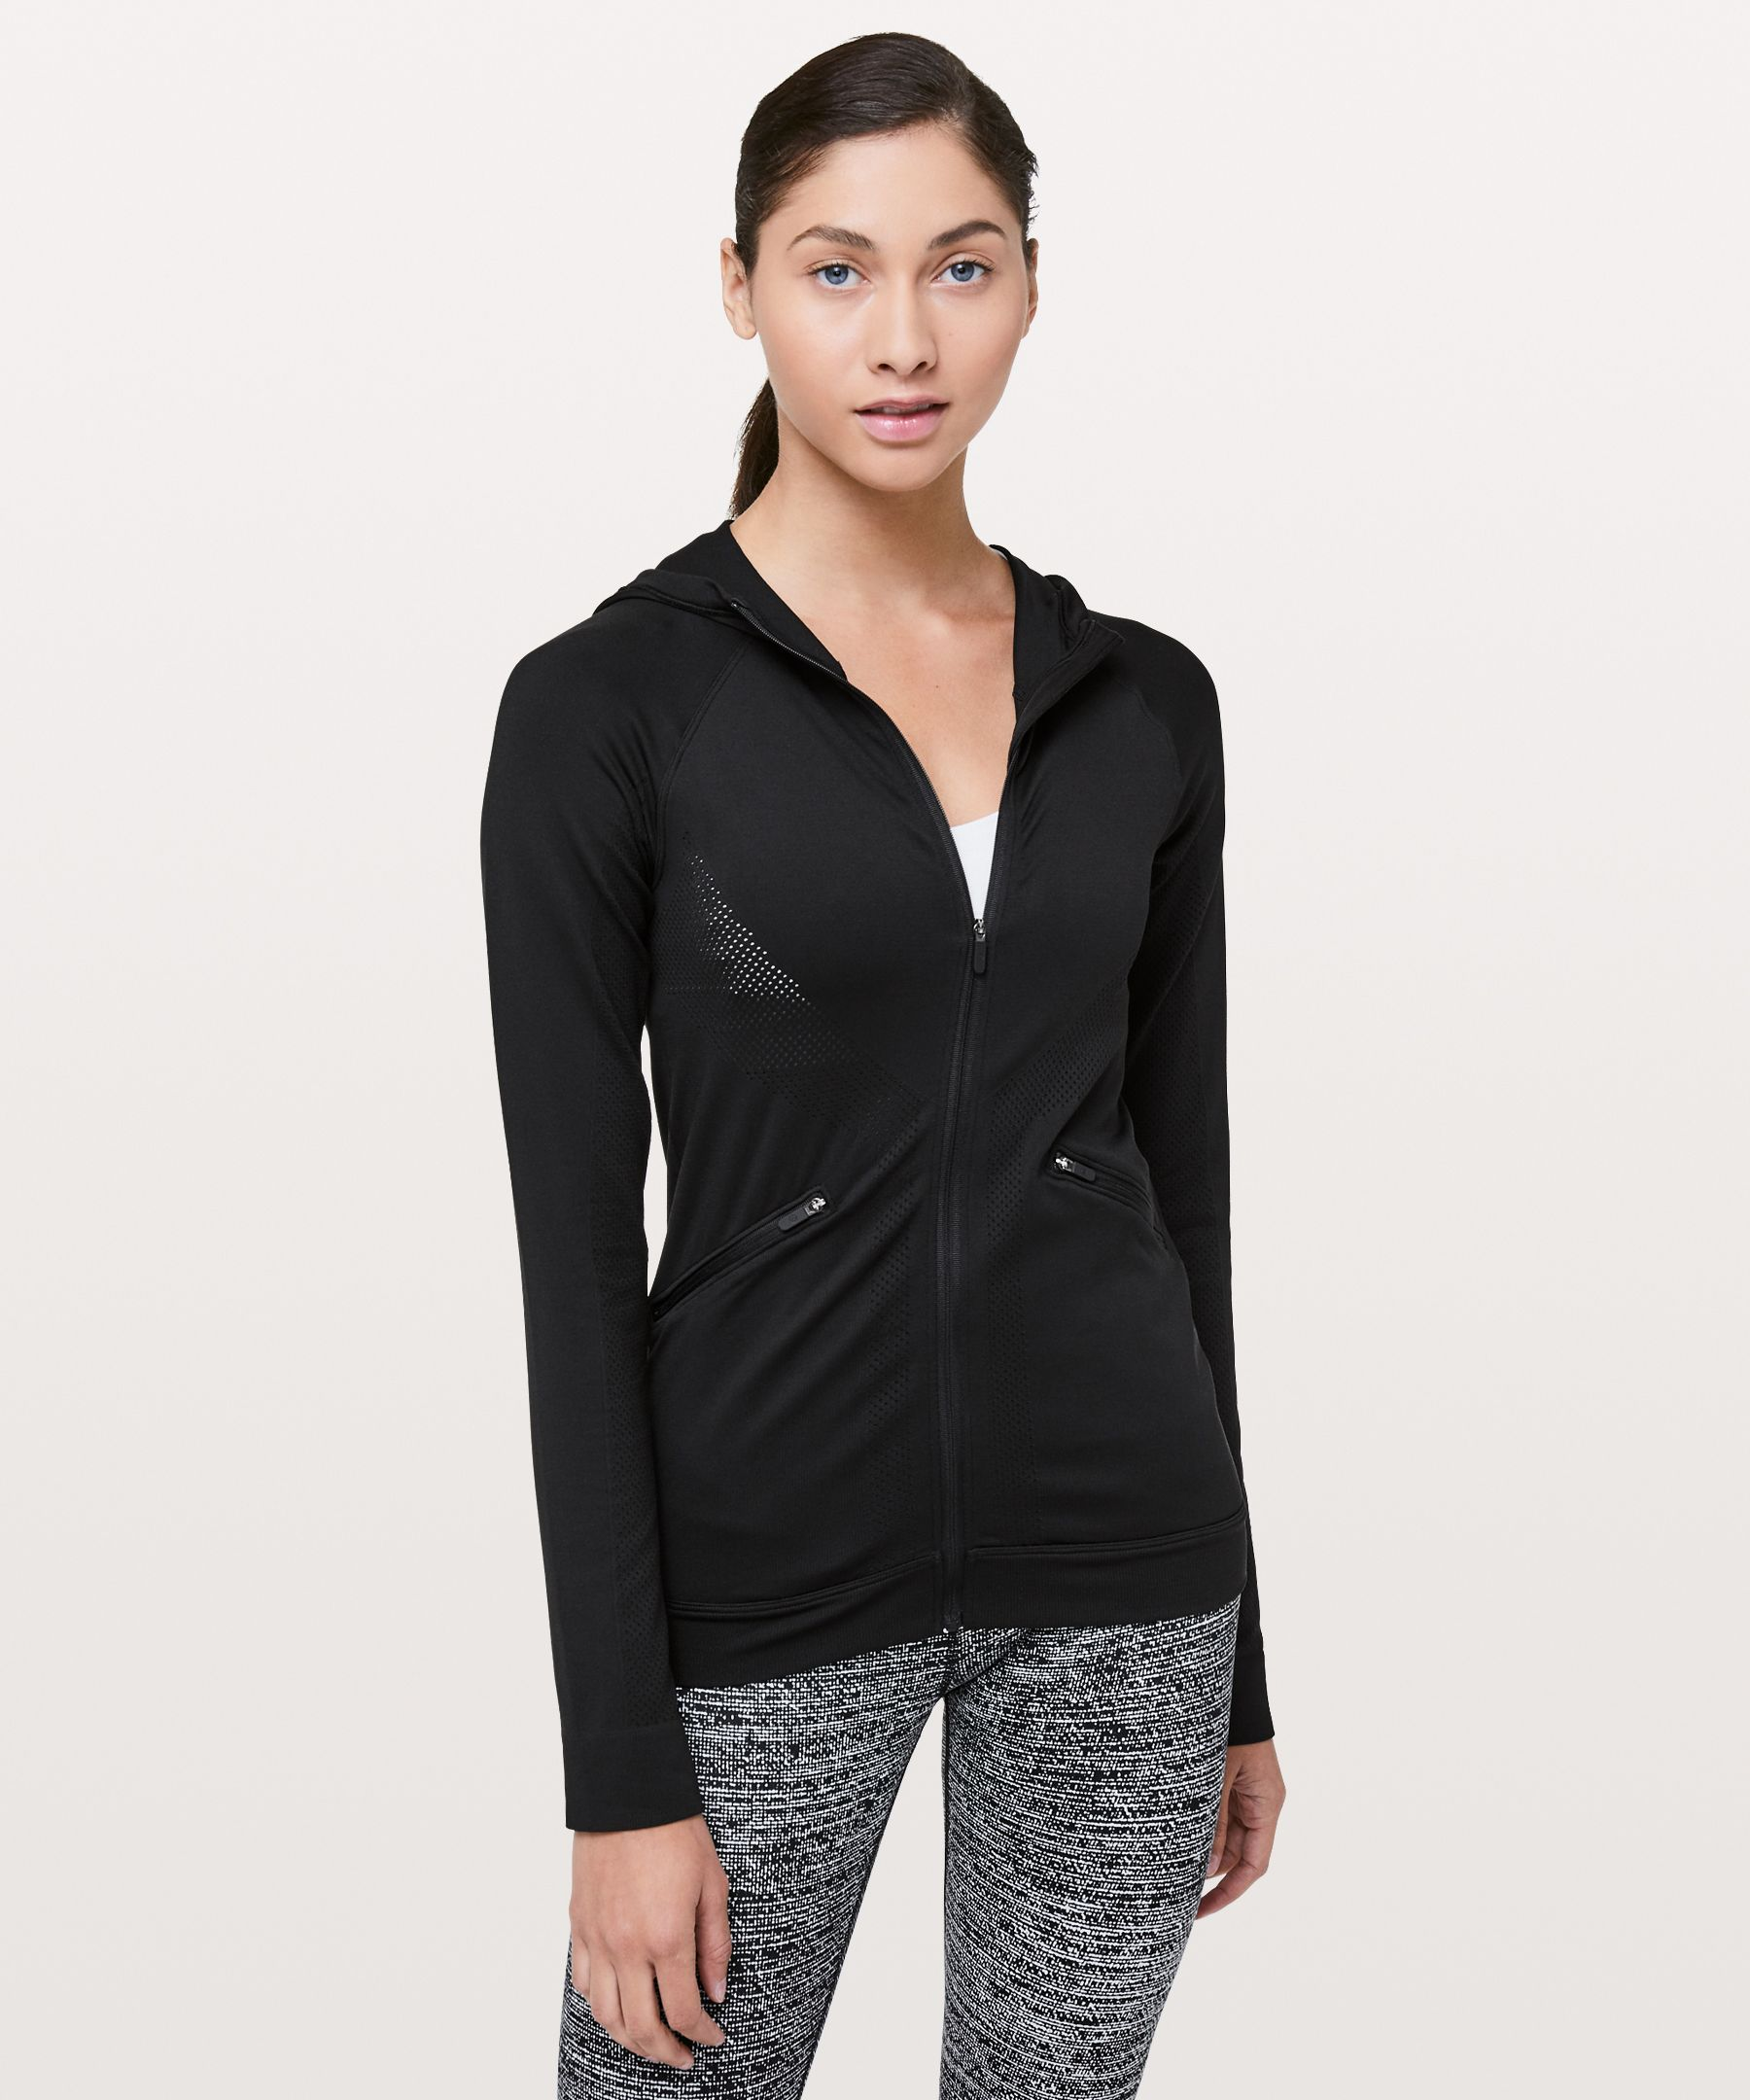 Lululemon Ventilate Jacket In Black